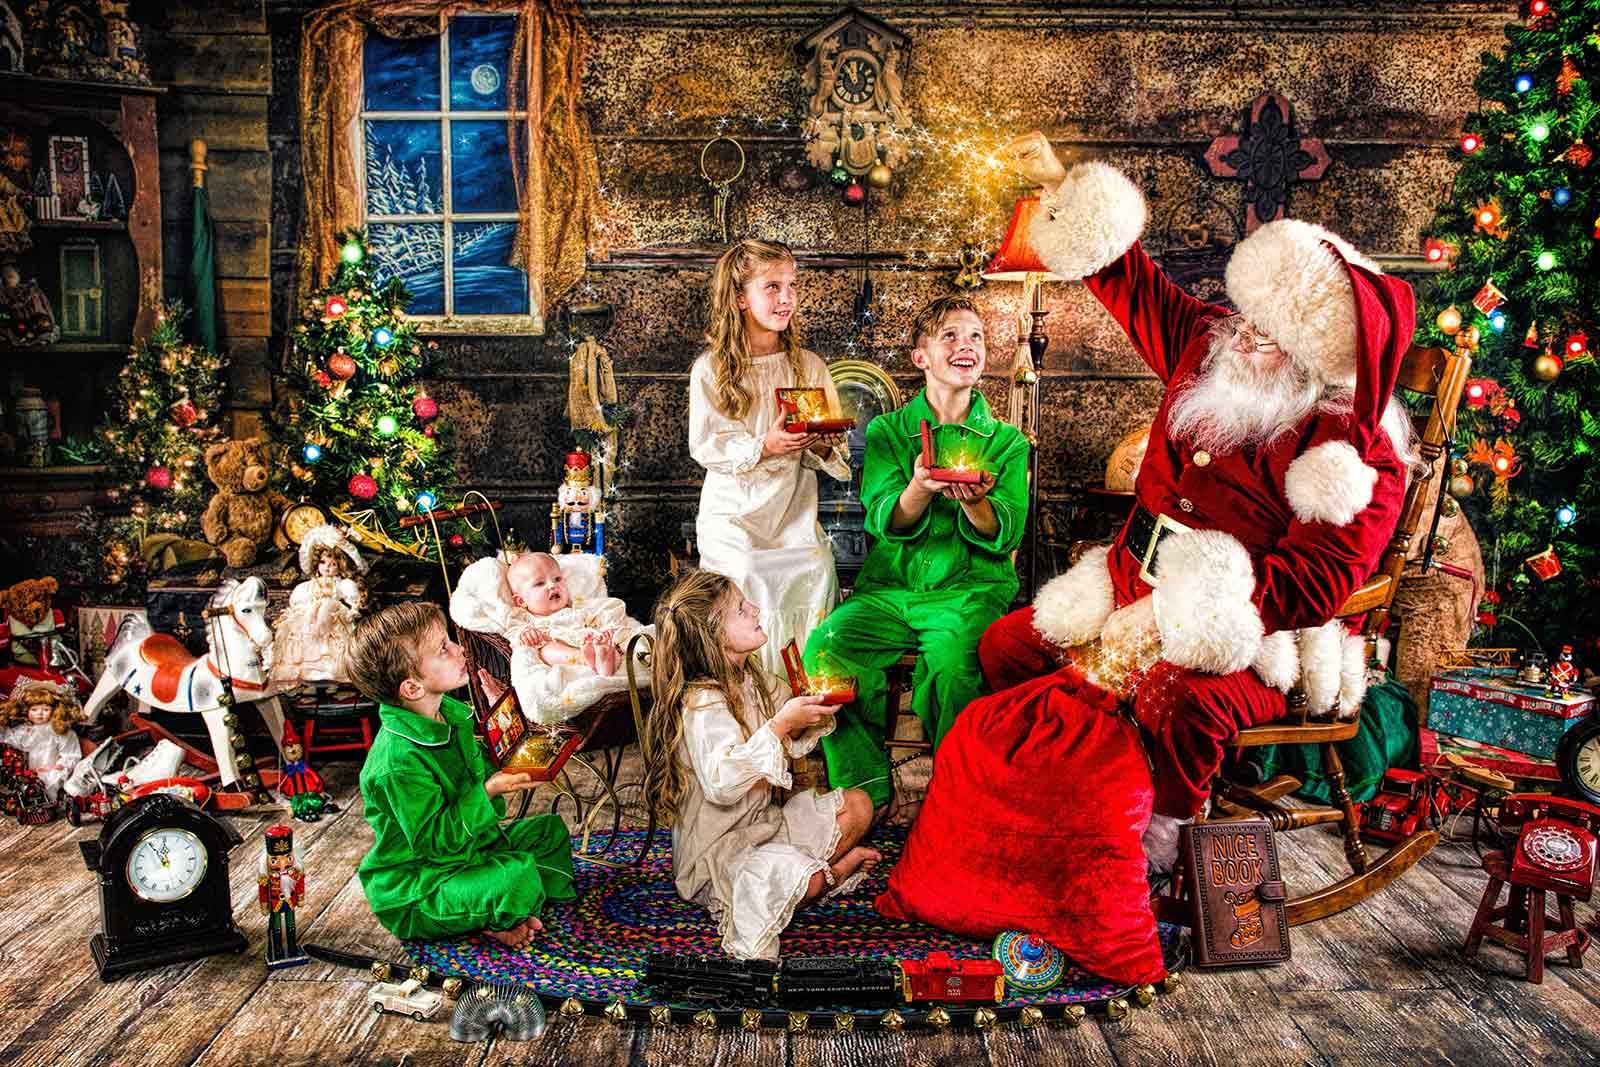 001_Magic-of-Santa-Anna-Thielen-Photography